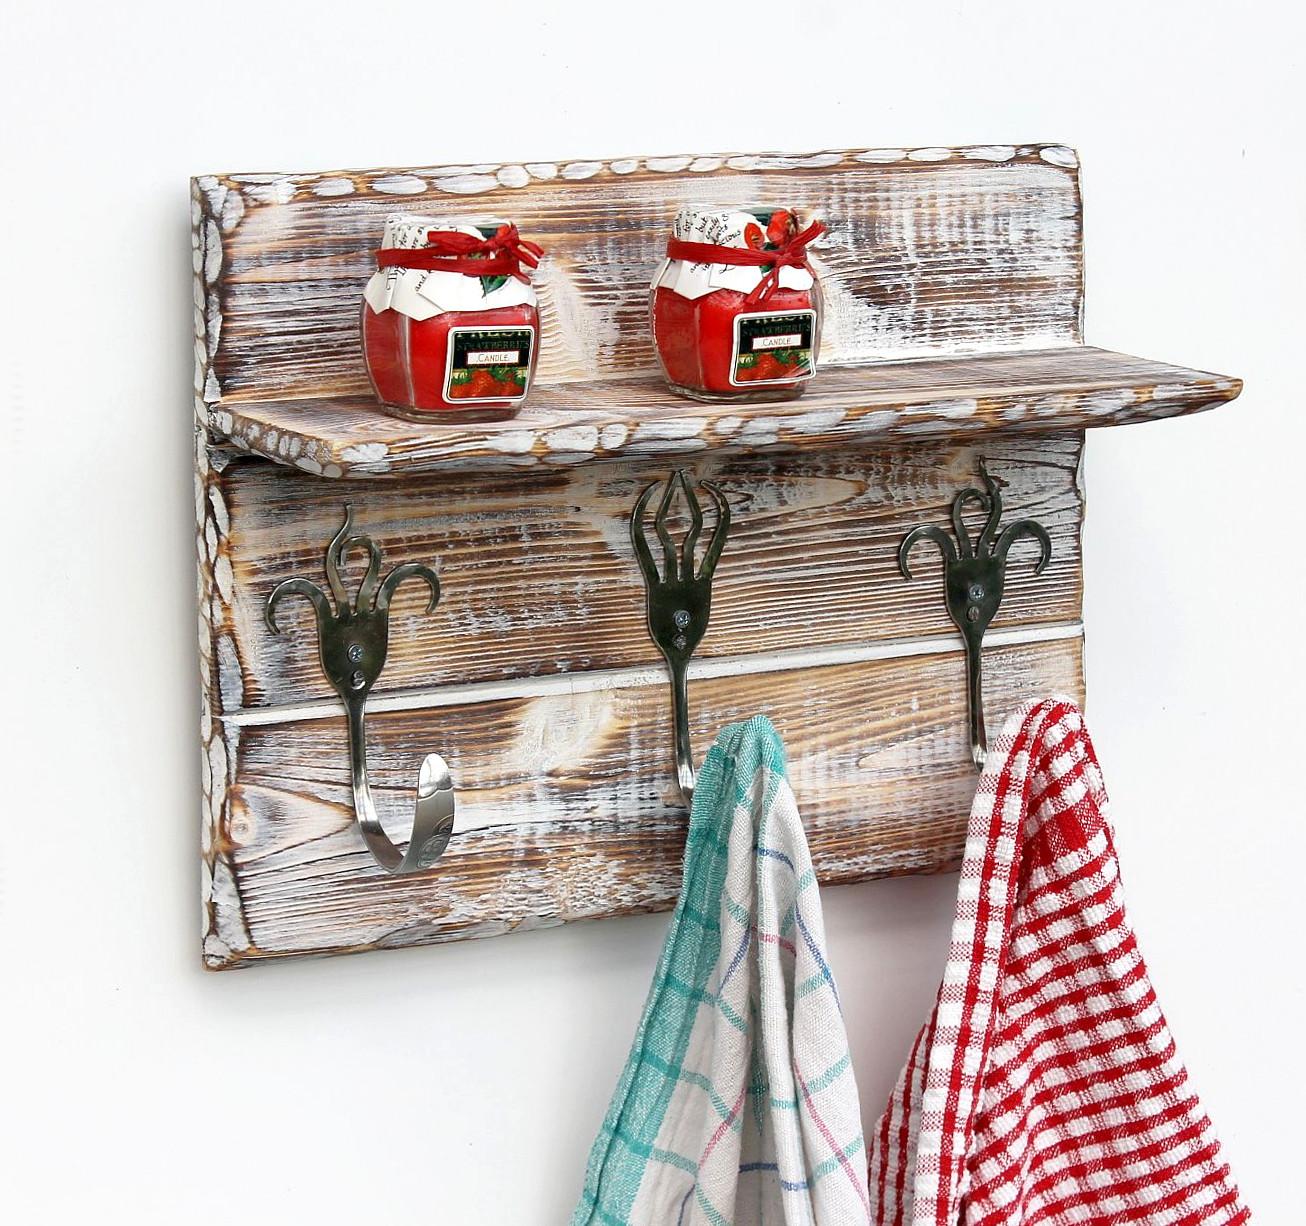 Full Size of Ikea Handtuchhalter Küche Ideen Handtuchhalter Küche Handtuchhalter Küche Landhausstil Amazon Handtuchhalter Küche Küche Handtuchhalter Küche